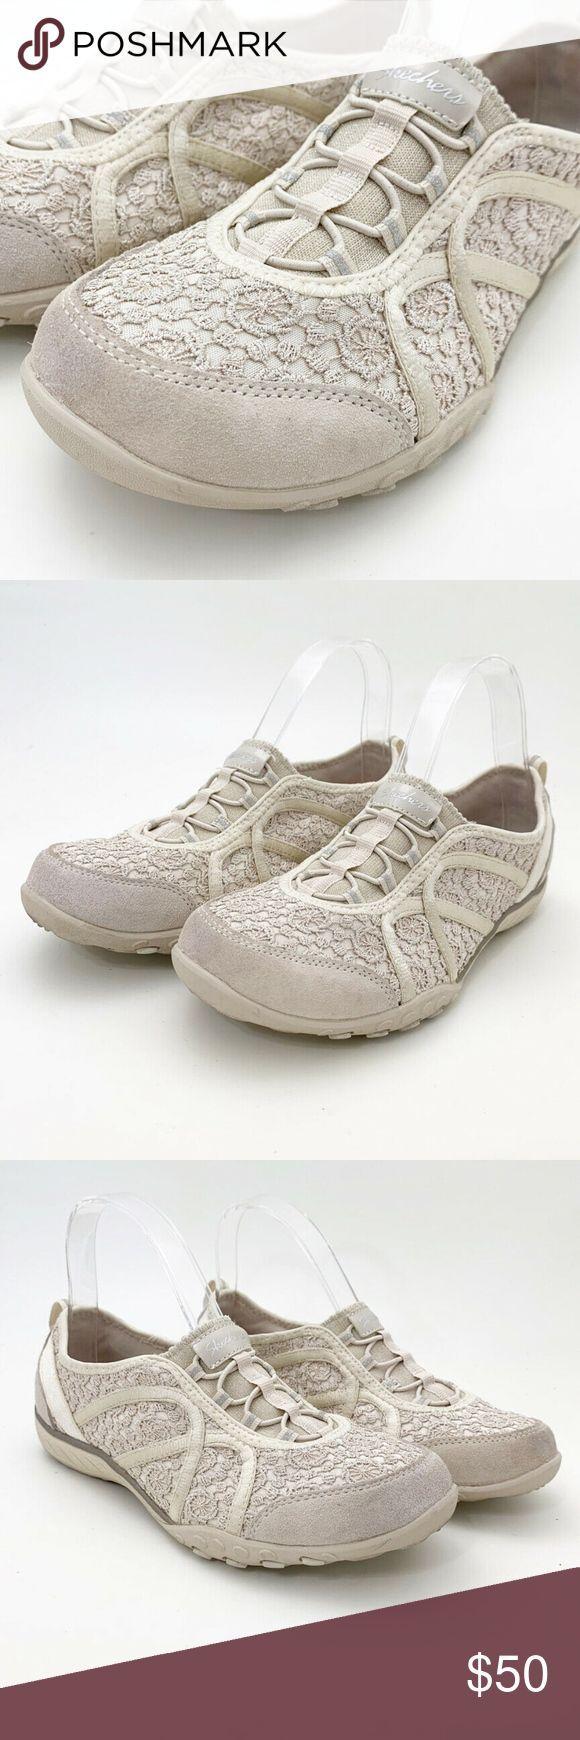 Skechers women, Bridal wedding shoes